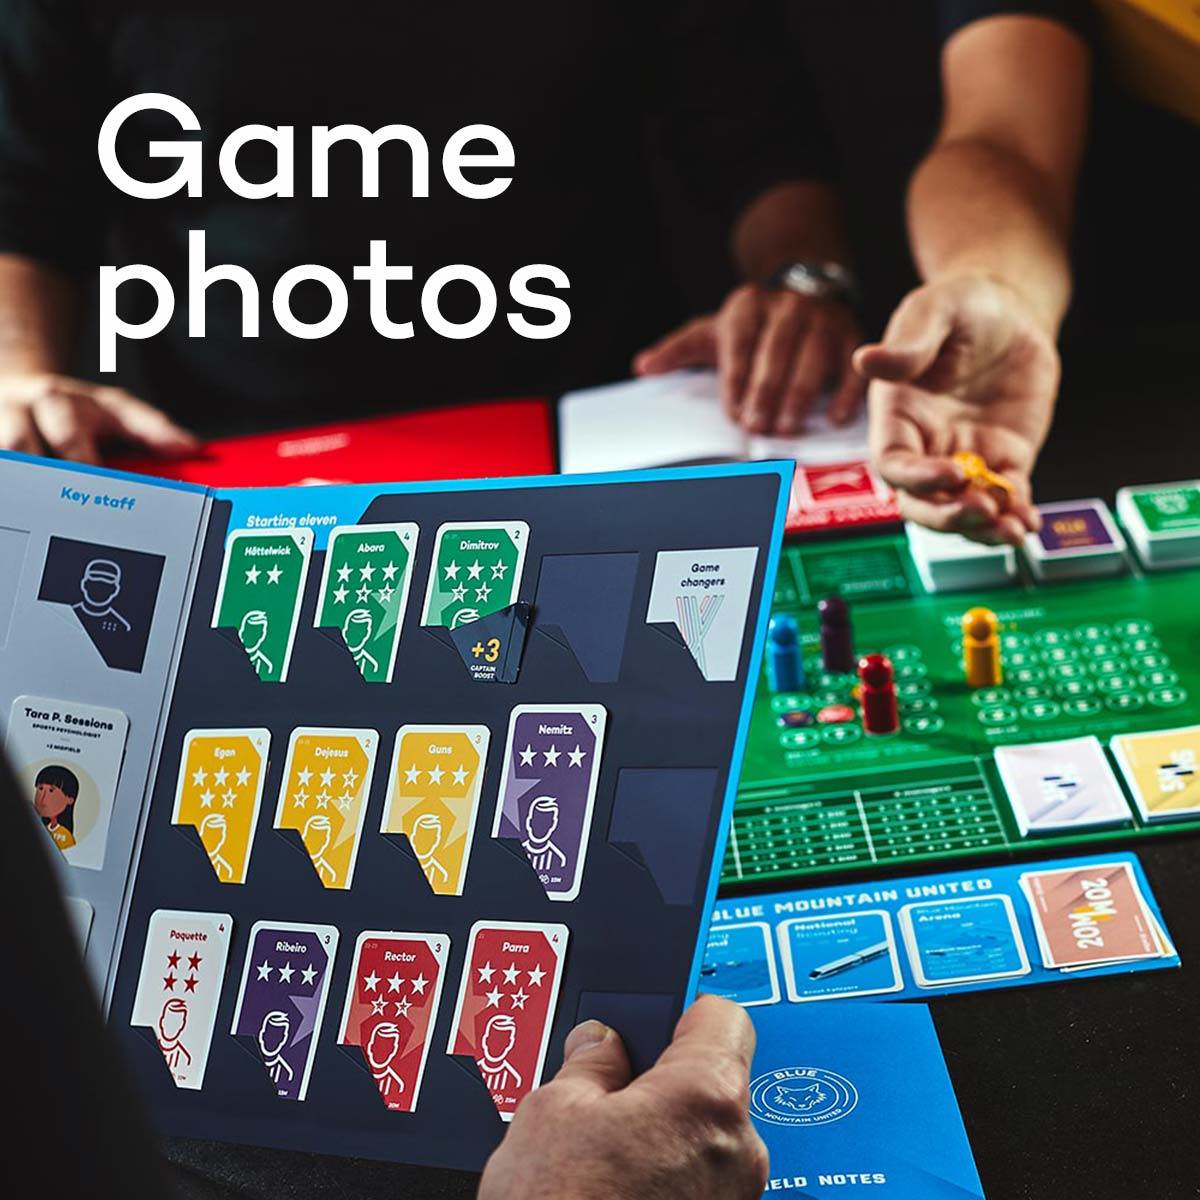 Download Superclub game photos